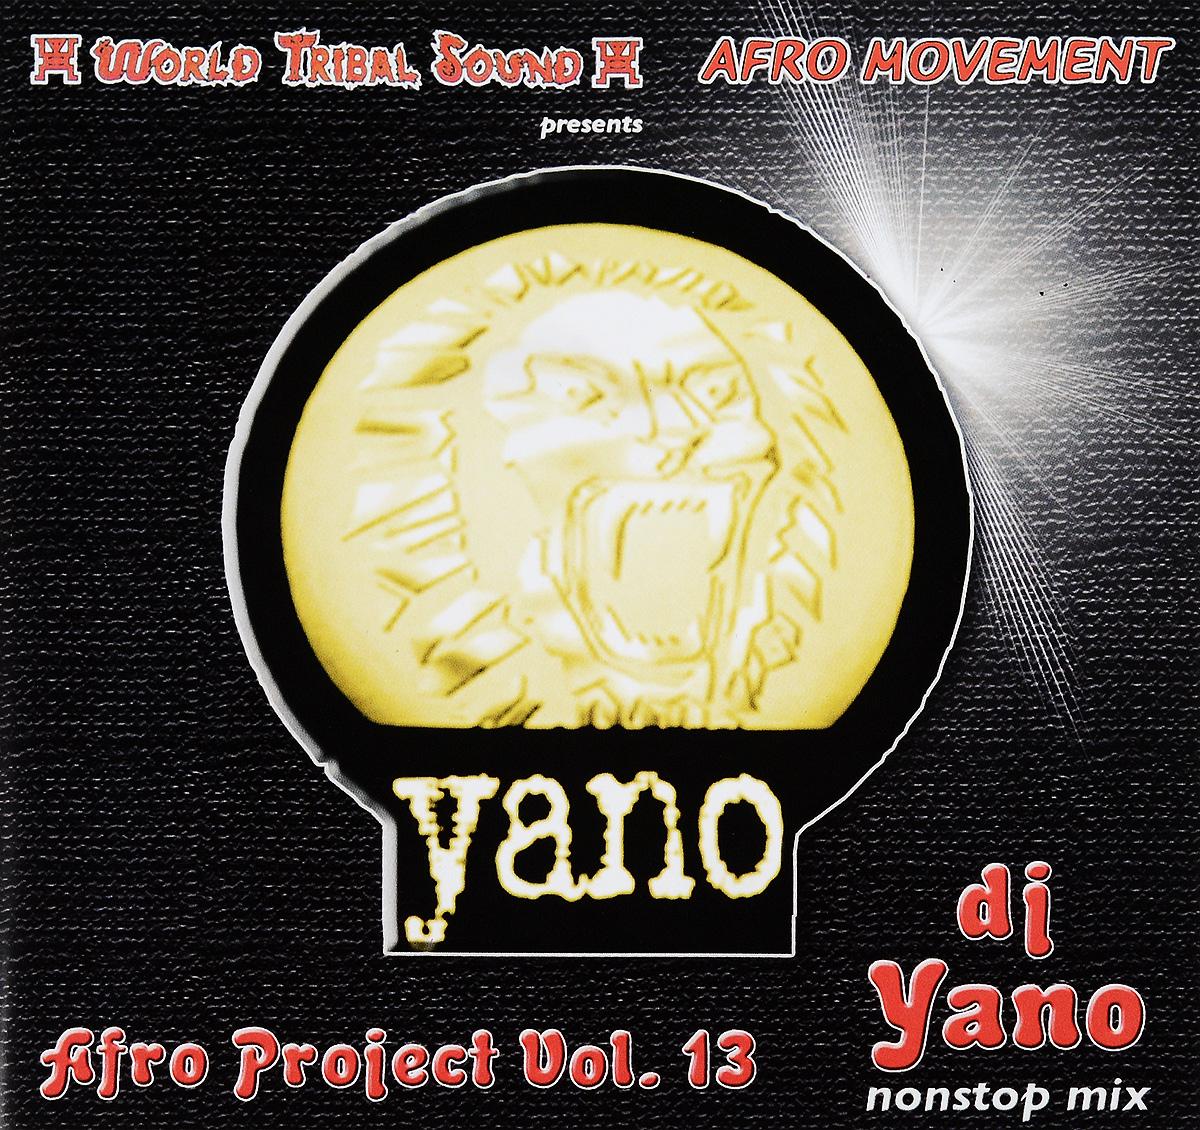 Dj Yano. Afro Project. Vol. 13